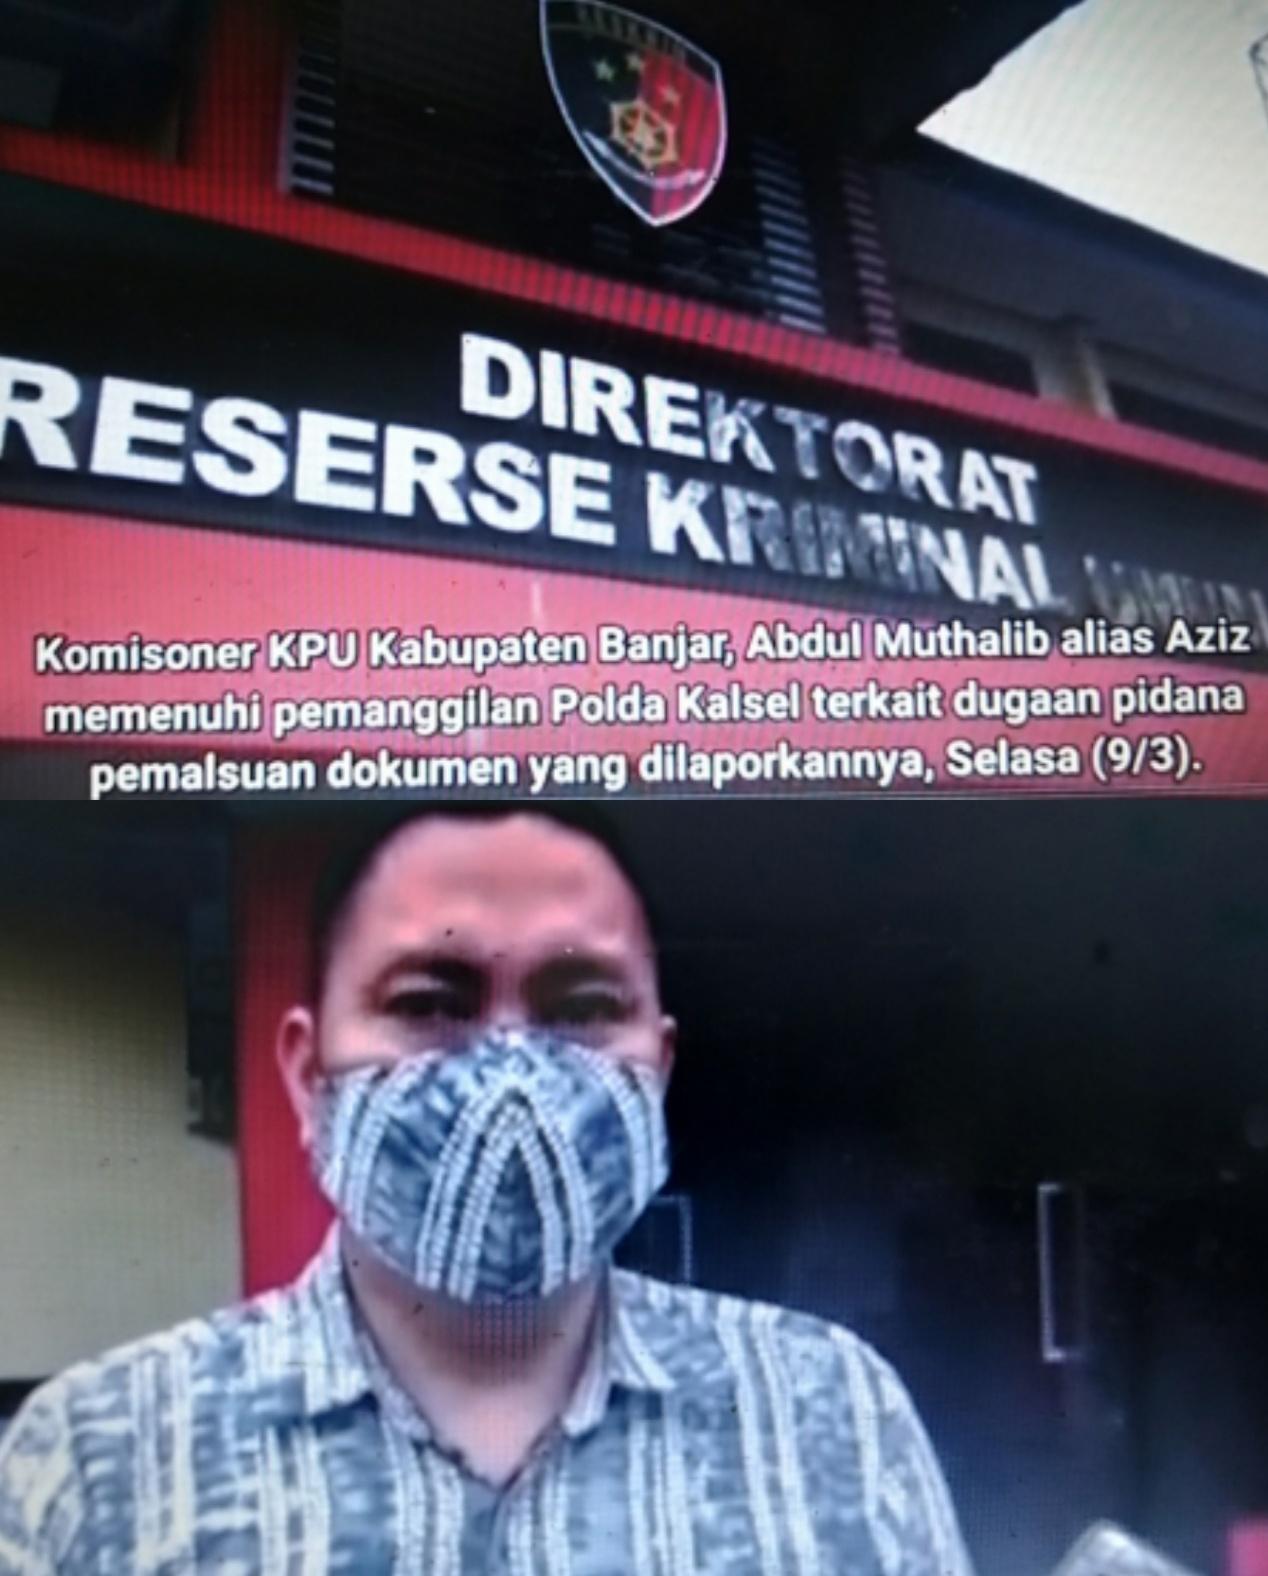 Naik Status Penyidikan, Polda Kalsel Serius Tangani Kasus Pemalsuan Dokumen Pilgub Kalsel